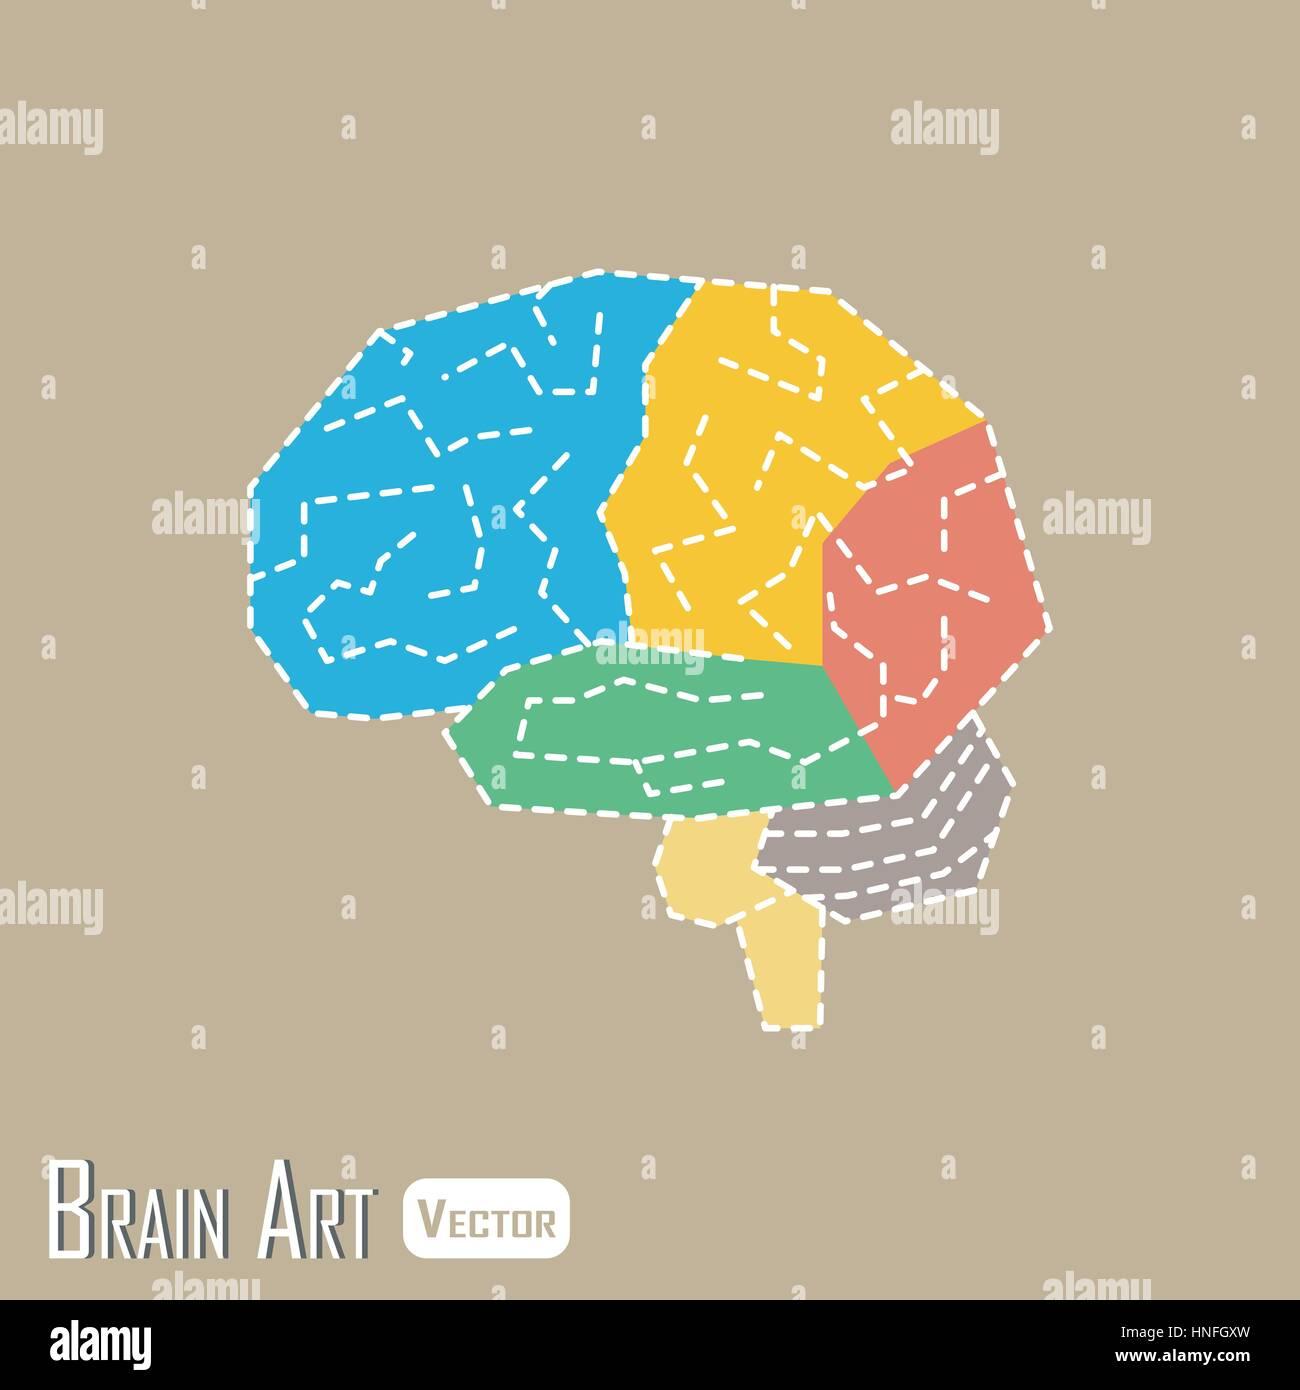 Brain Anatomy Flat Design Frontal Stockfotos & Brain Anatomy Flat ...